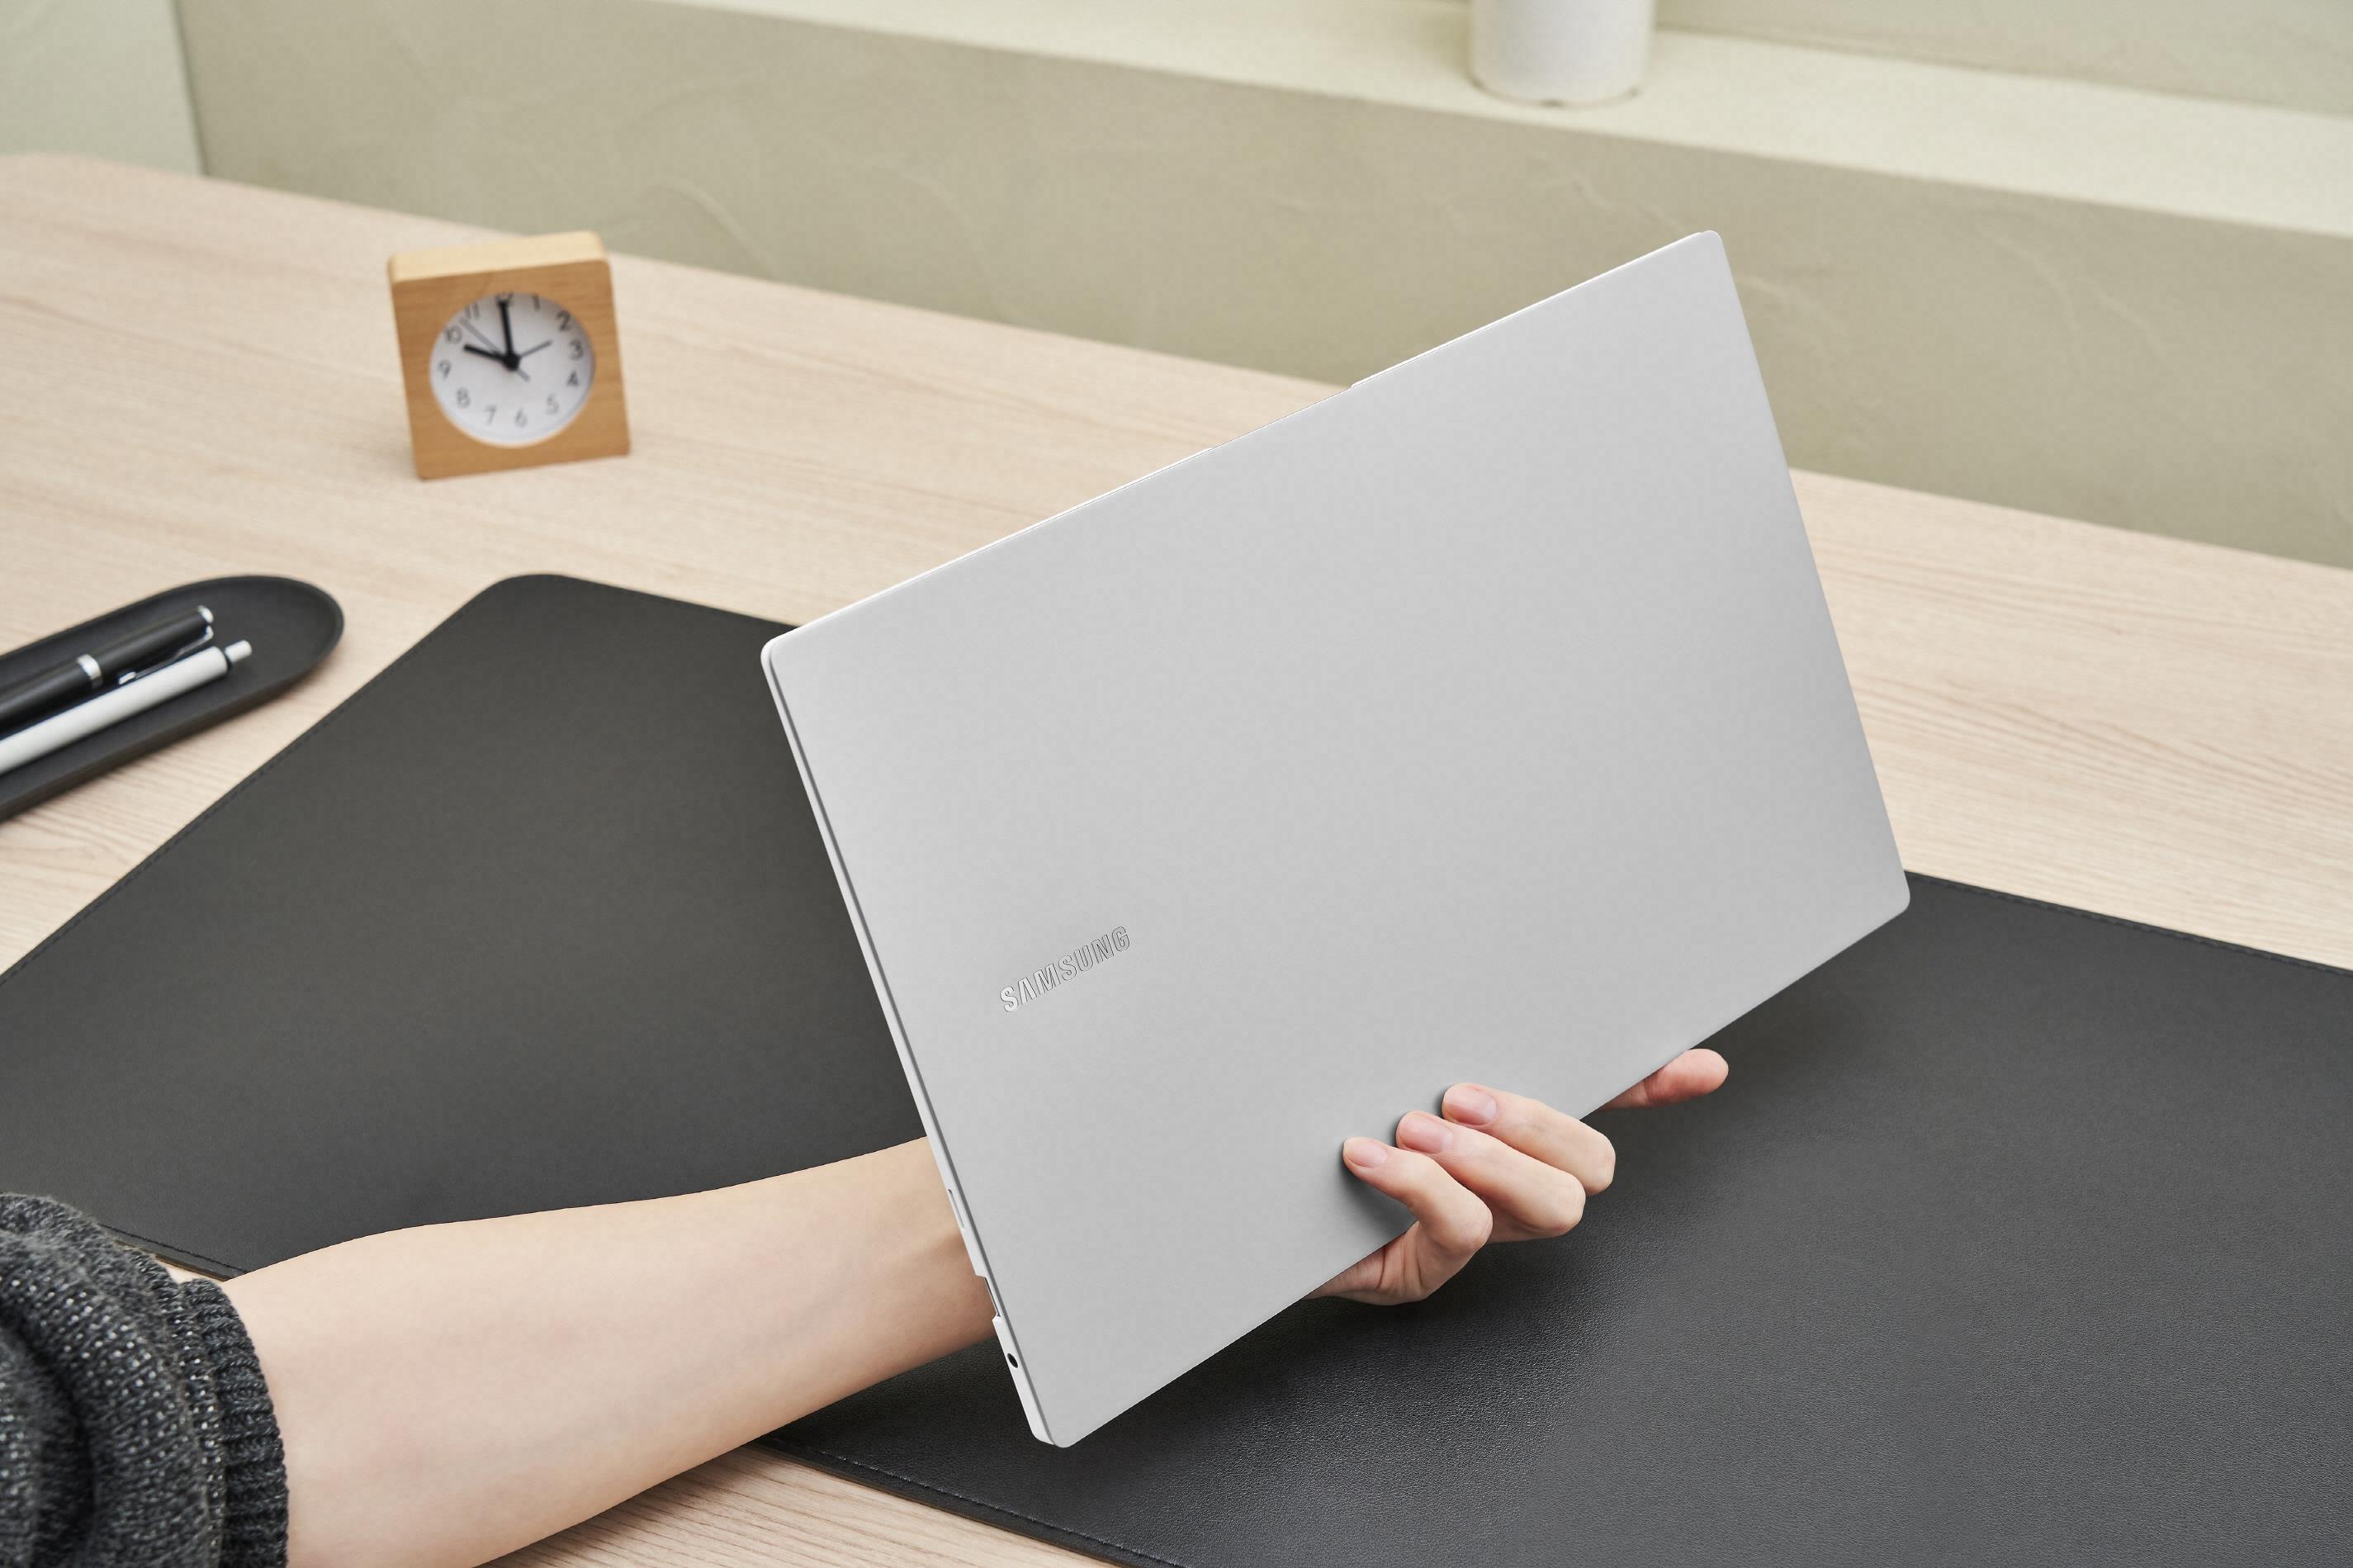 Samsung Unveils New Galaxy Book Pro & Galaxy Book Pro 360 Laptops